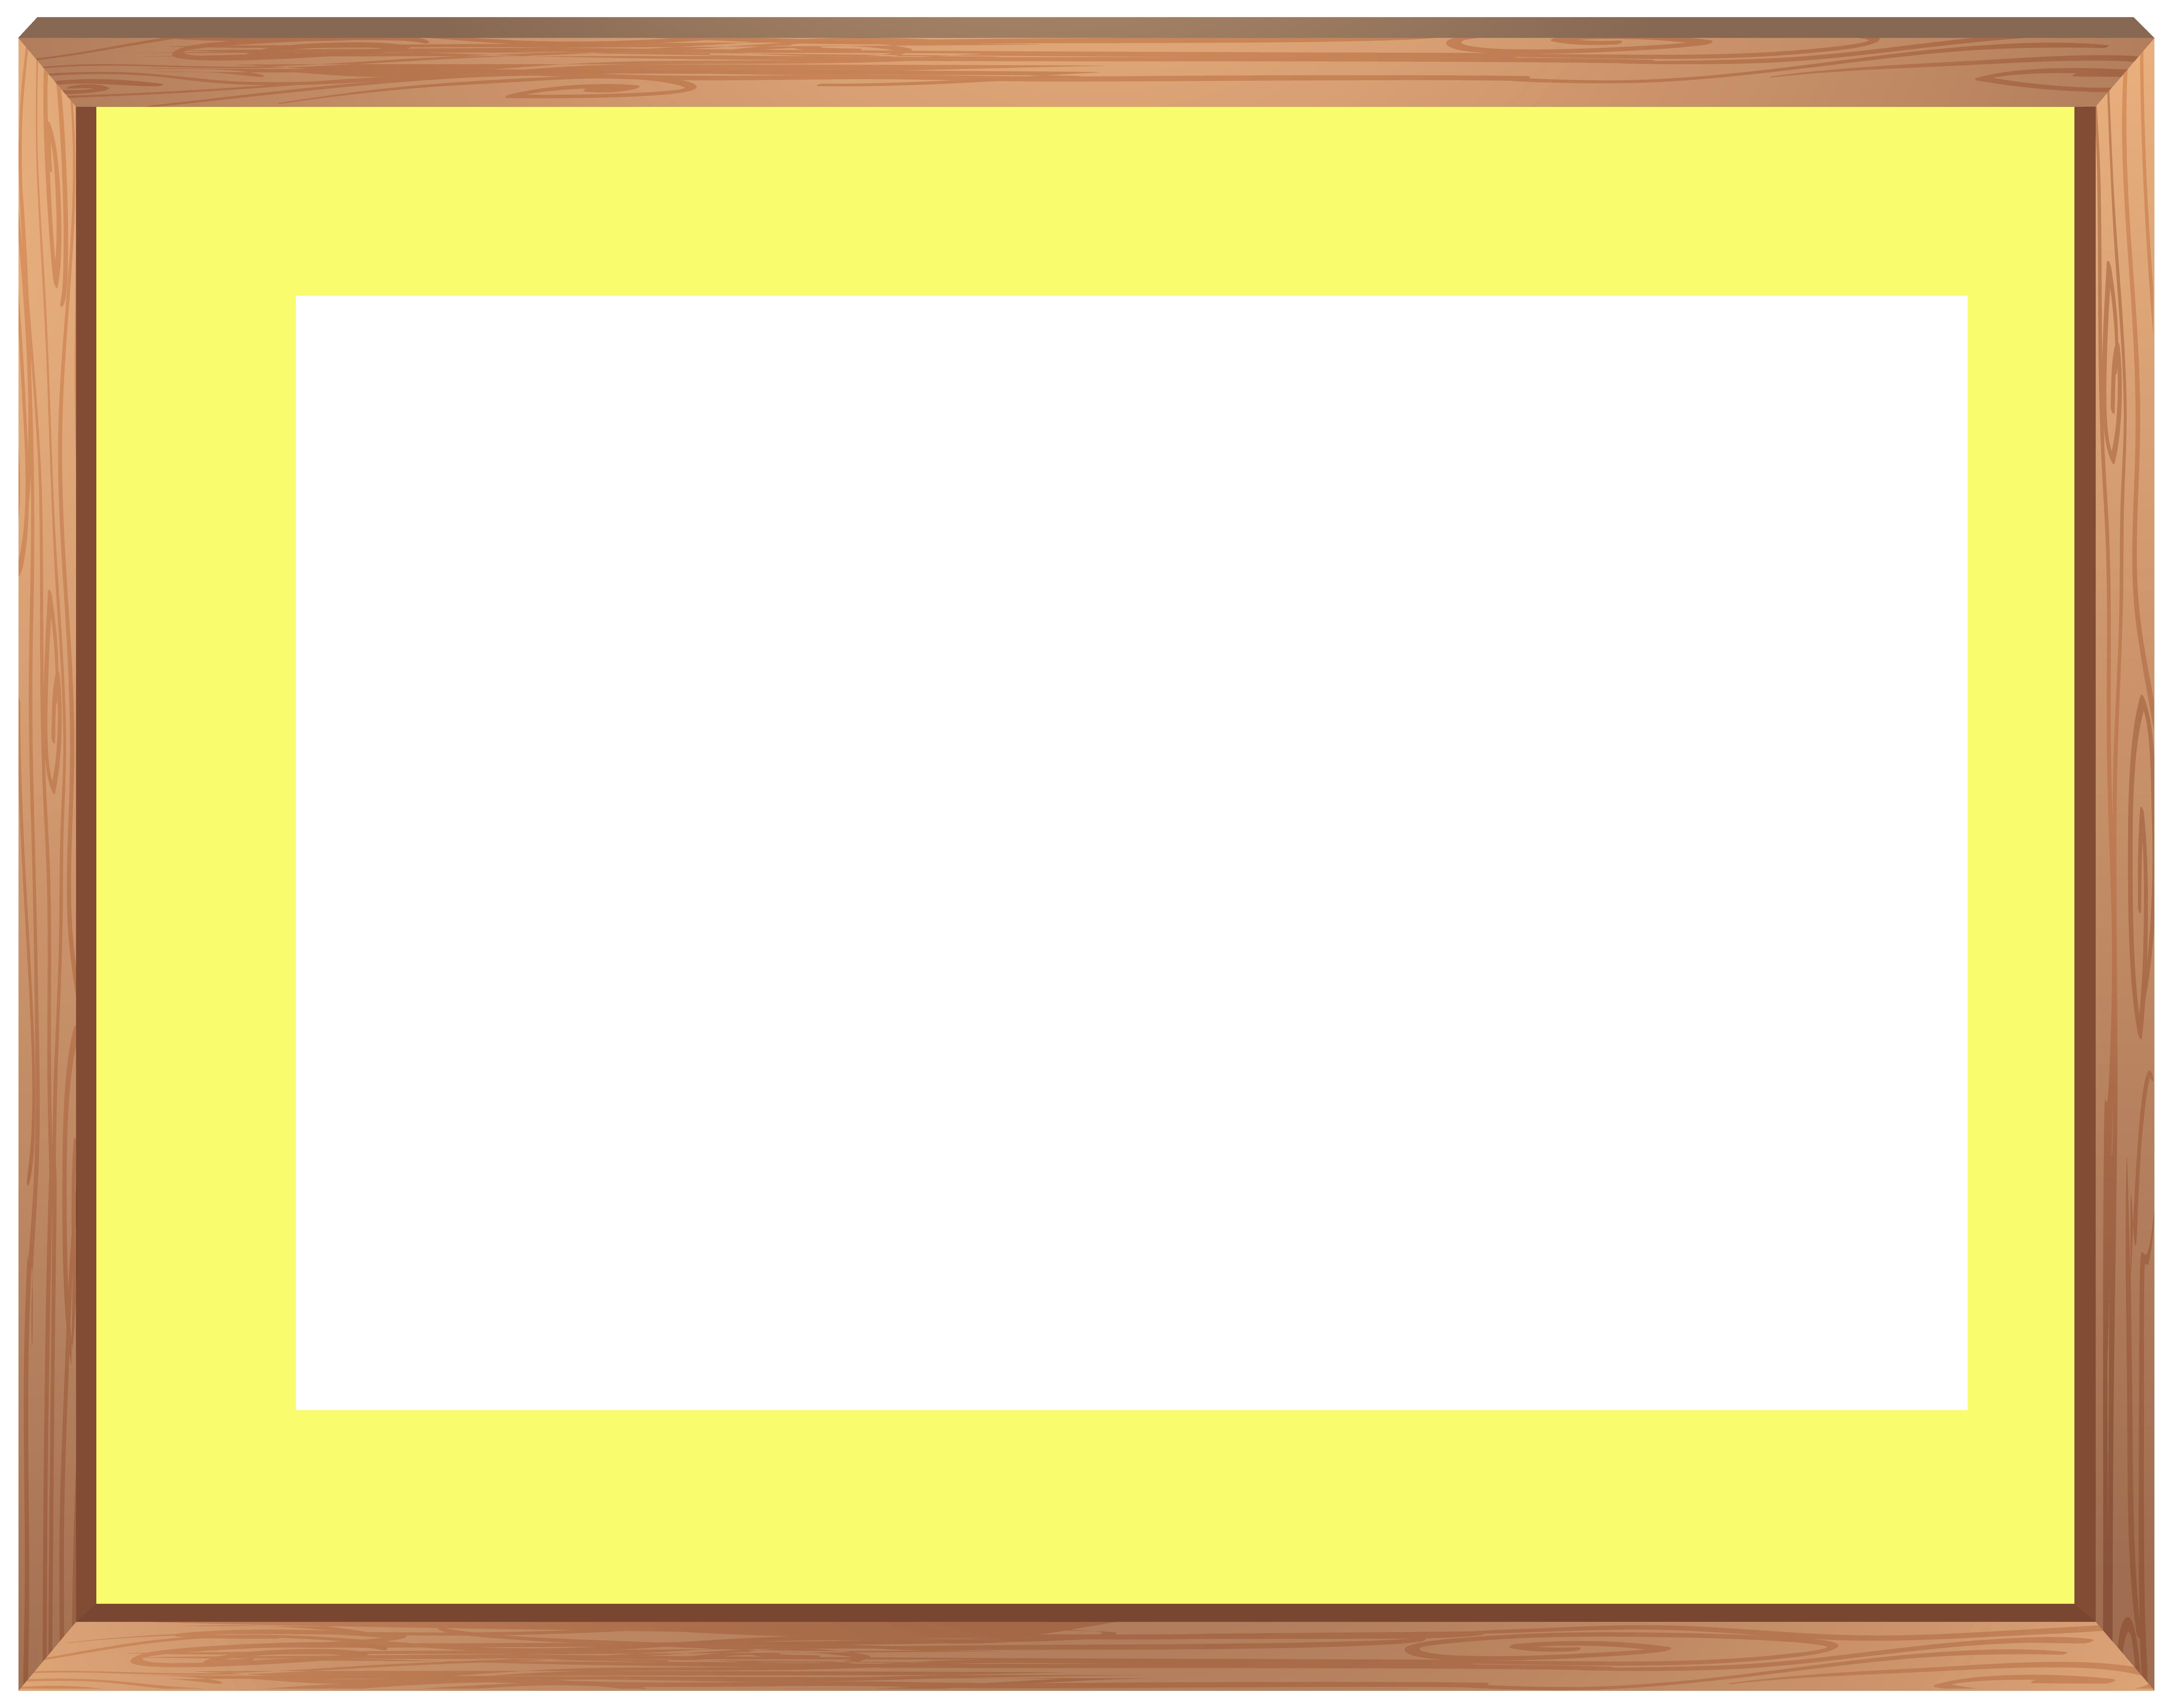 Wooden Border Frame PNG Clipart.